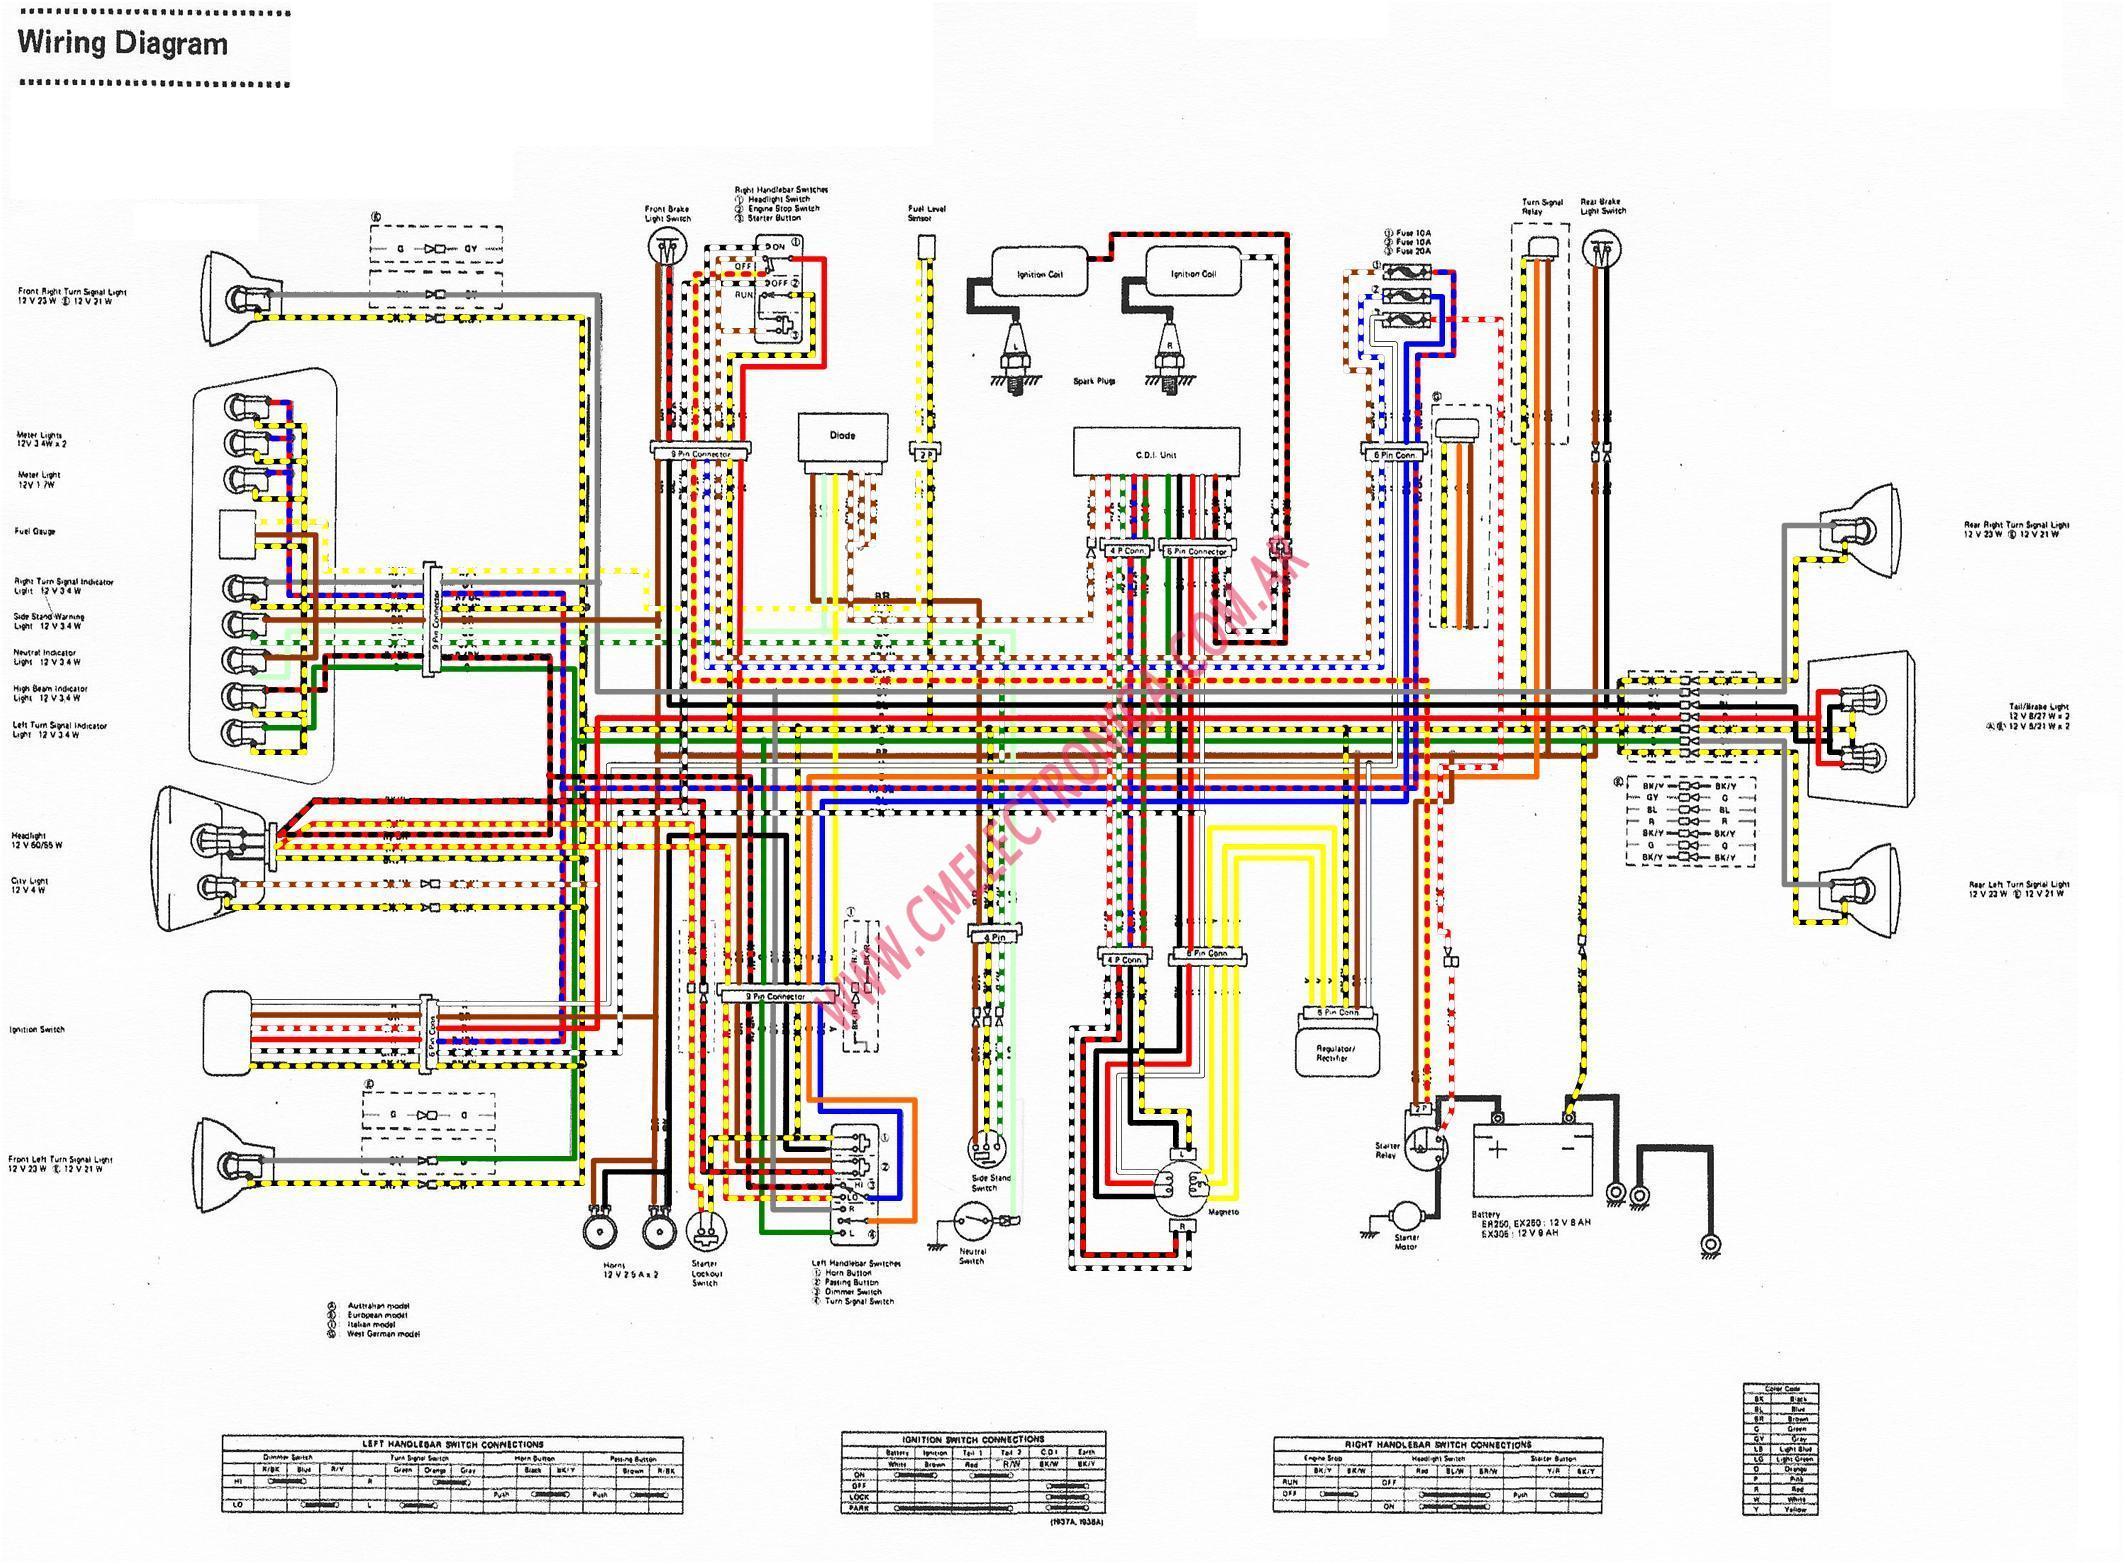 2012 Honda Rebel Wiring Diagram Ford 9n Wiring Cts Lsa Losdol2 Cabik Jeanjaures37 Fr